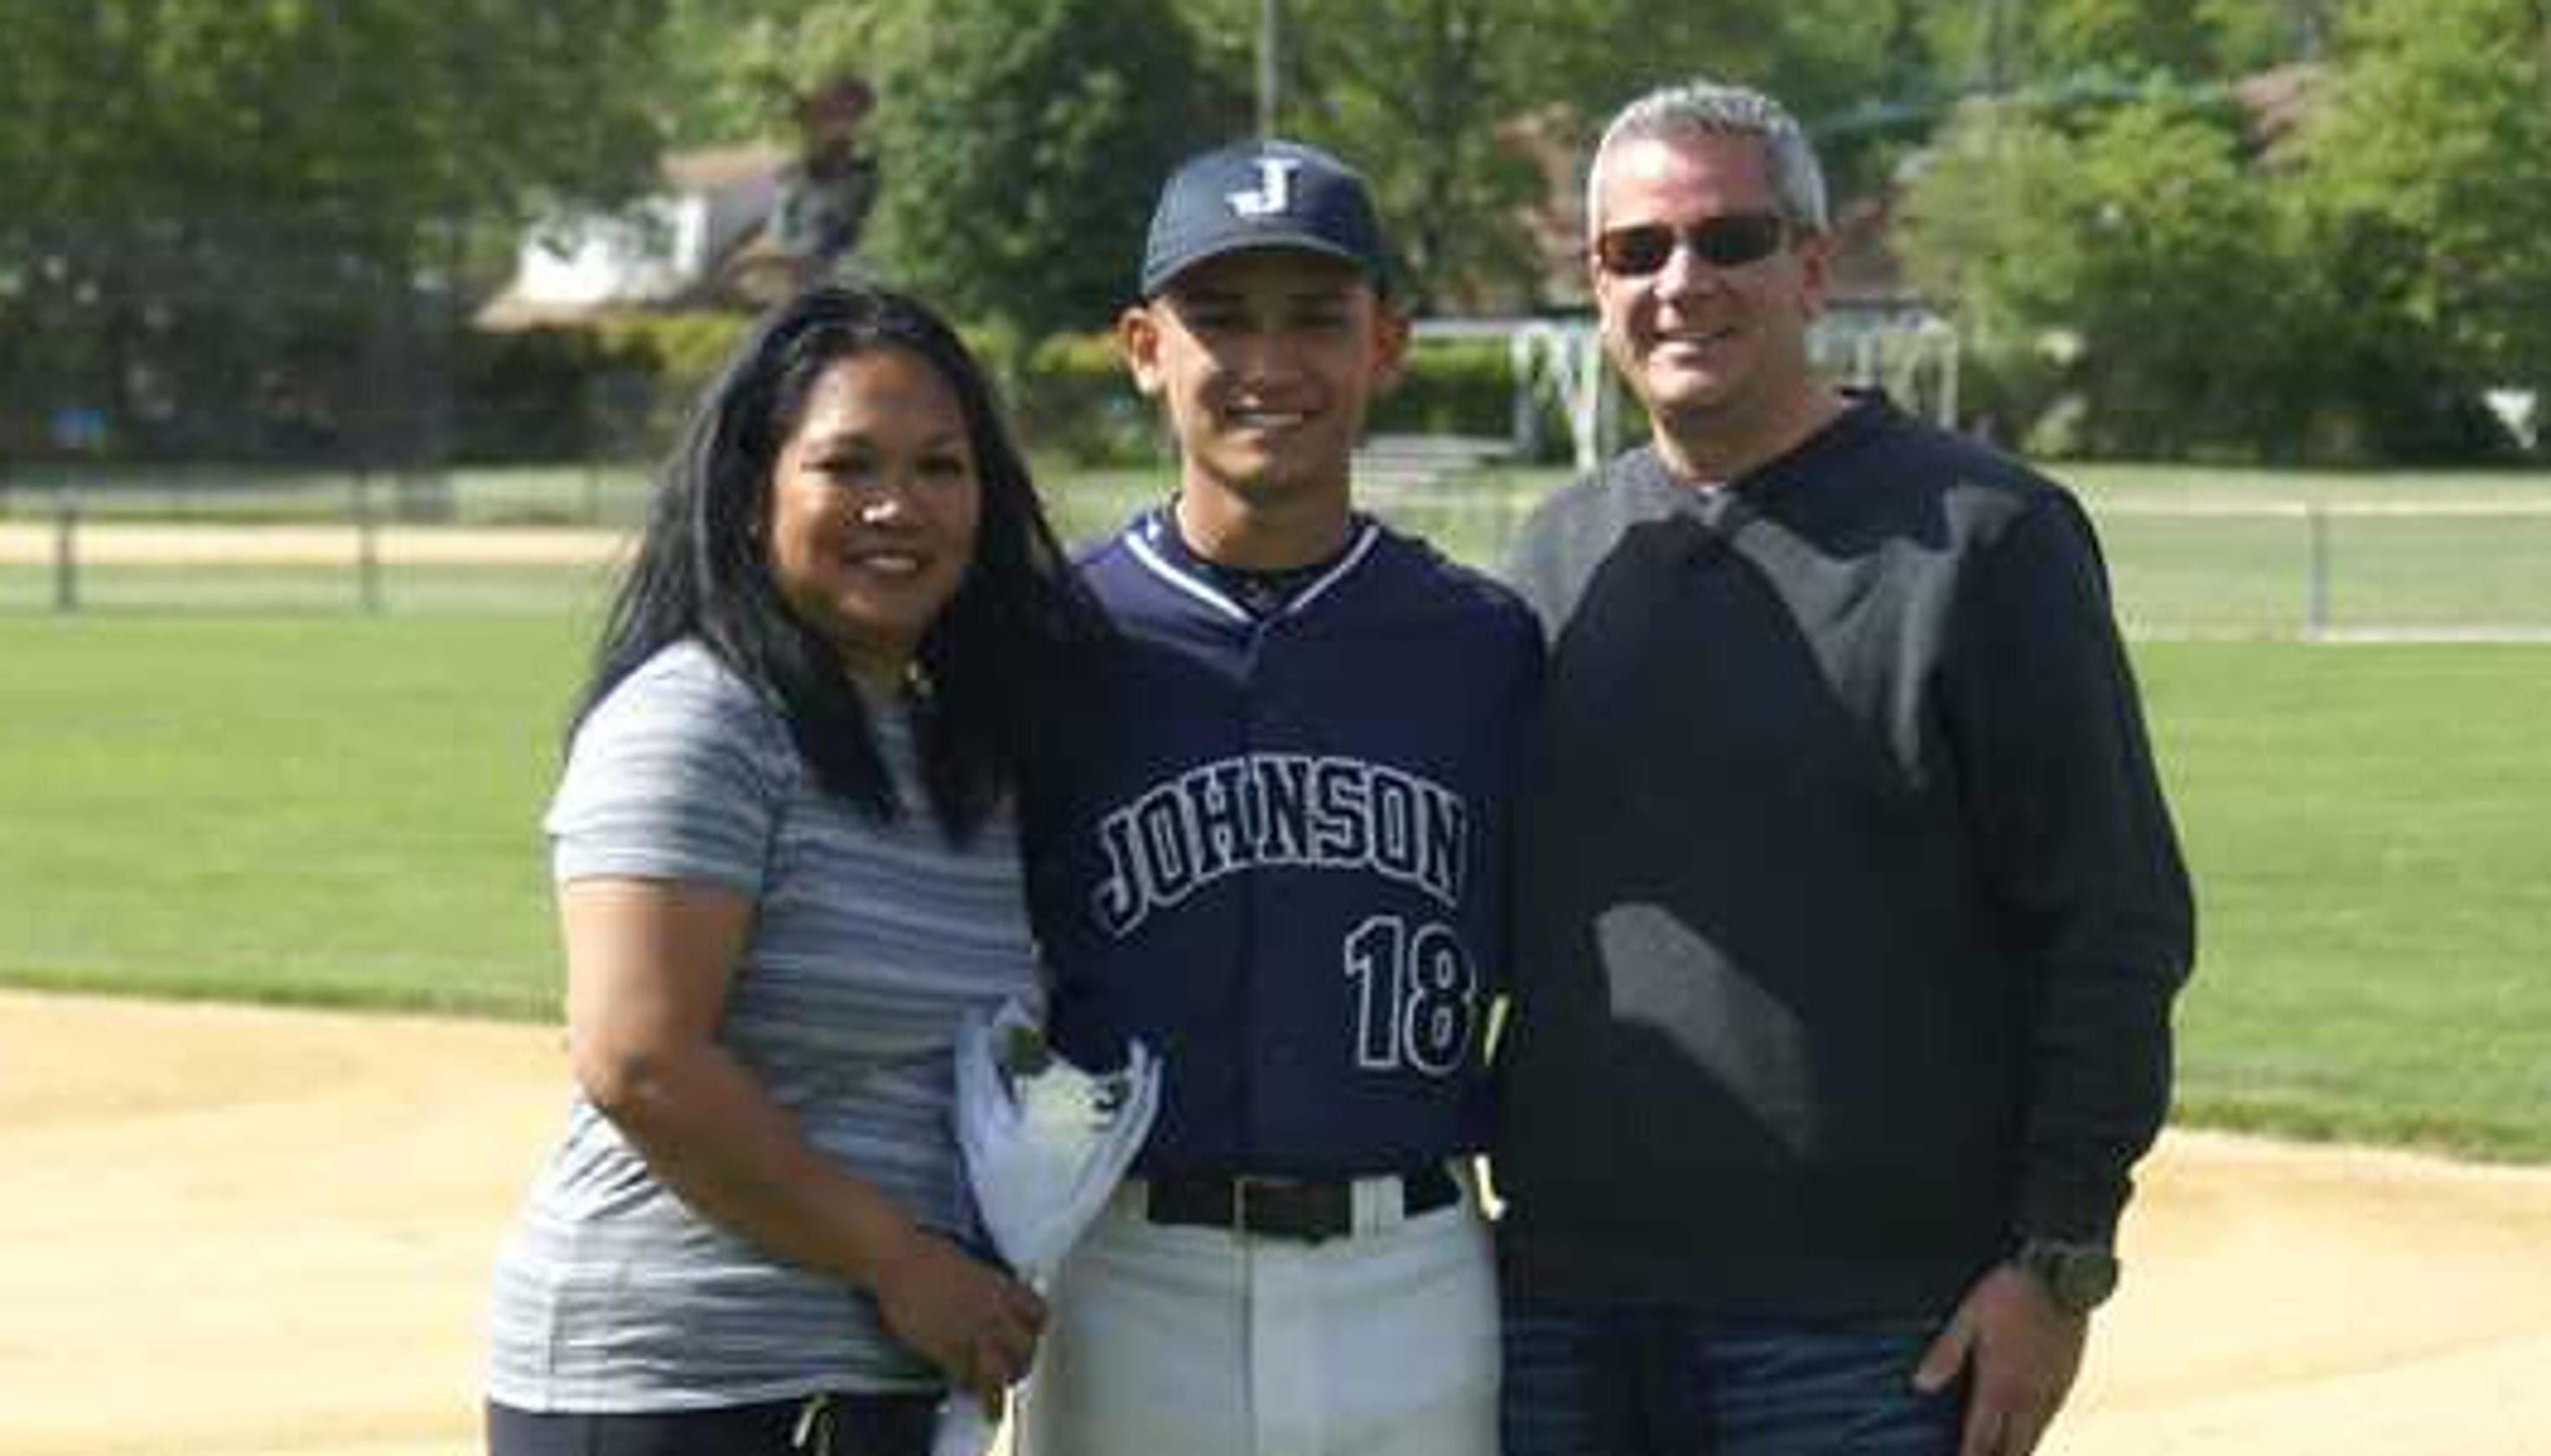 7a10d05d96b Arthur L. Johnson and St. Joseph baseball teams will honor Michael Sot